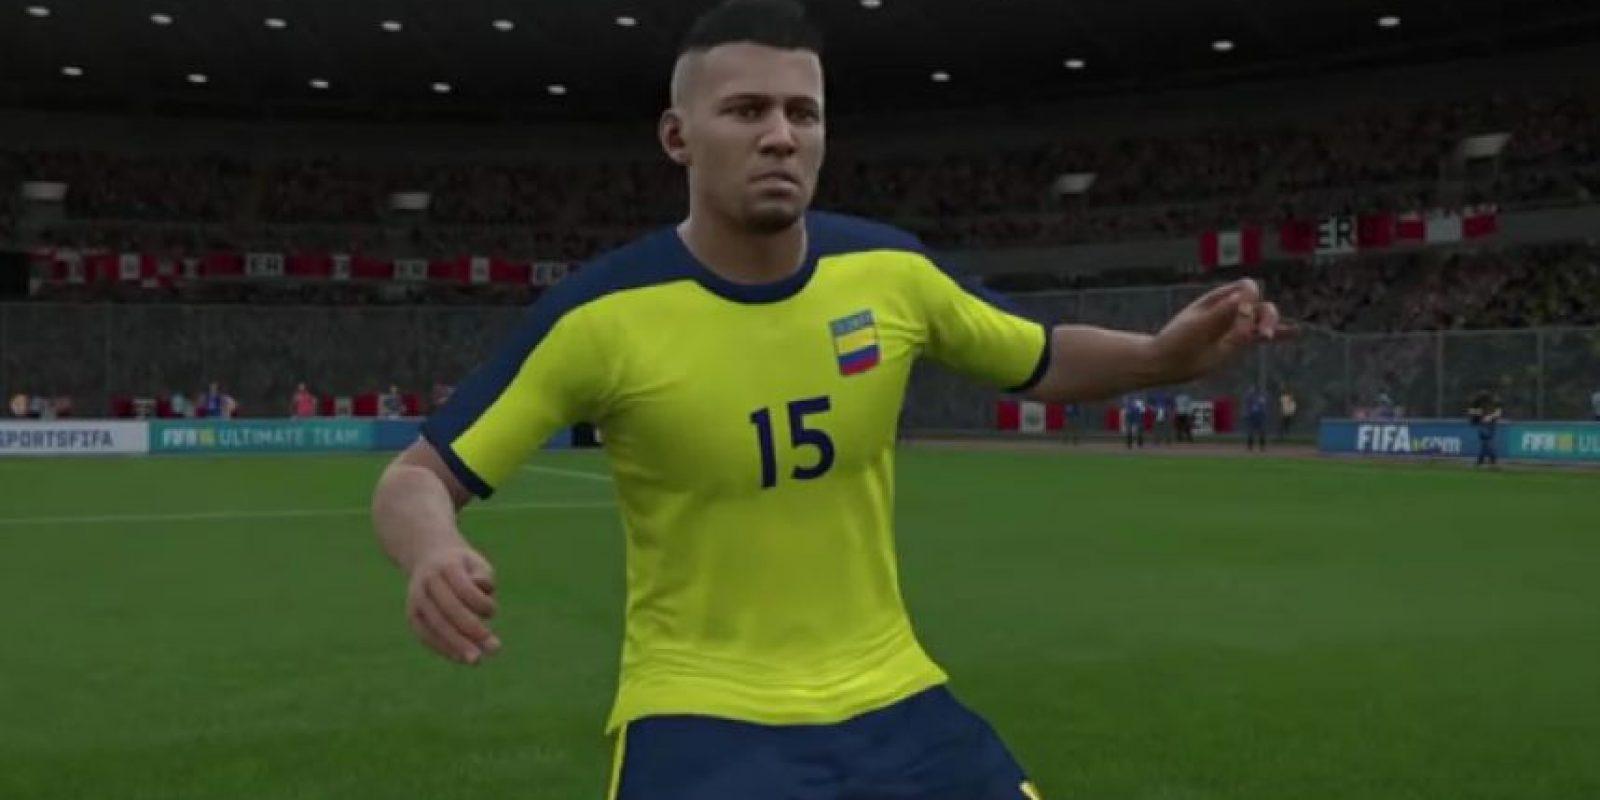 Foto:FIFA 16